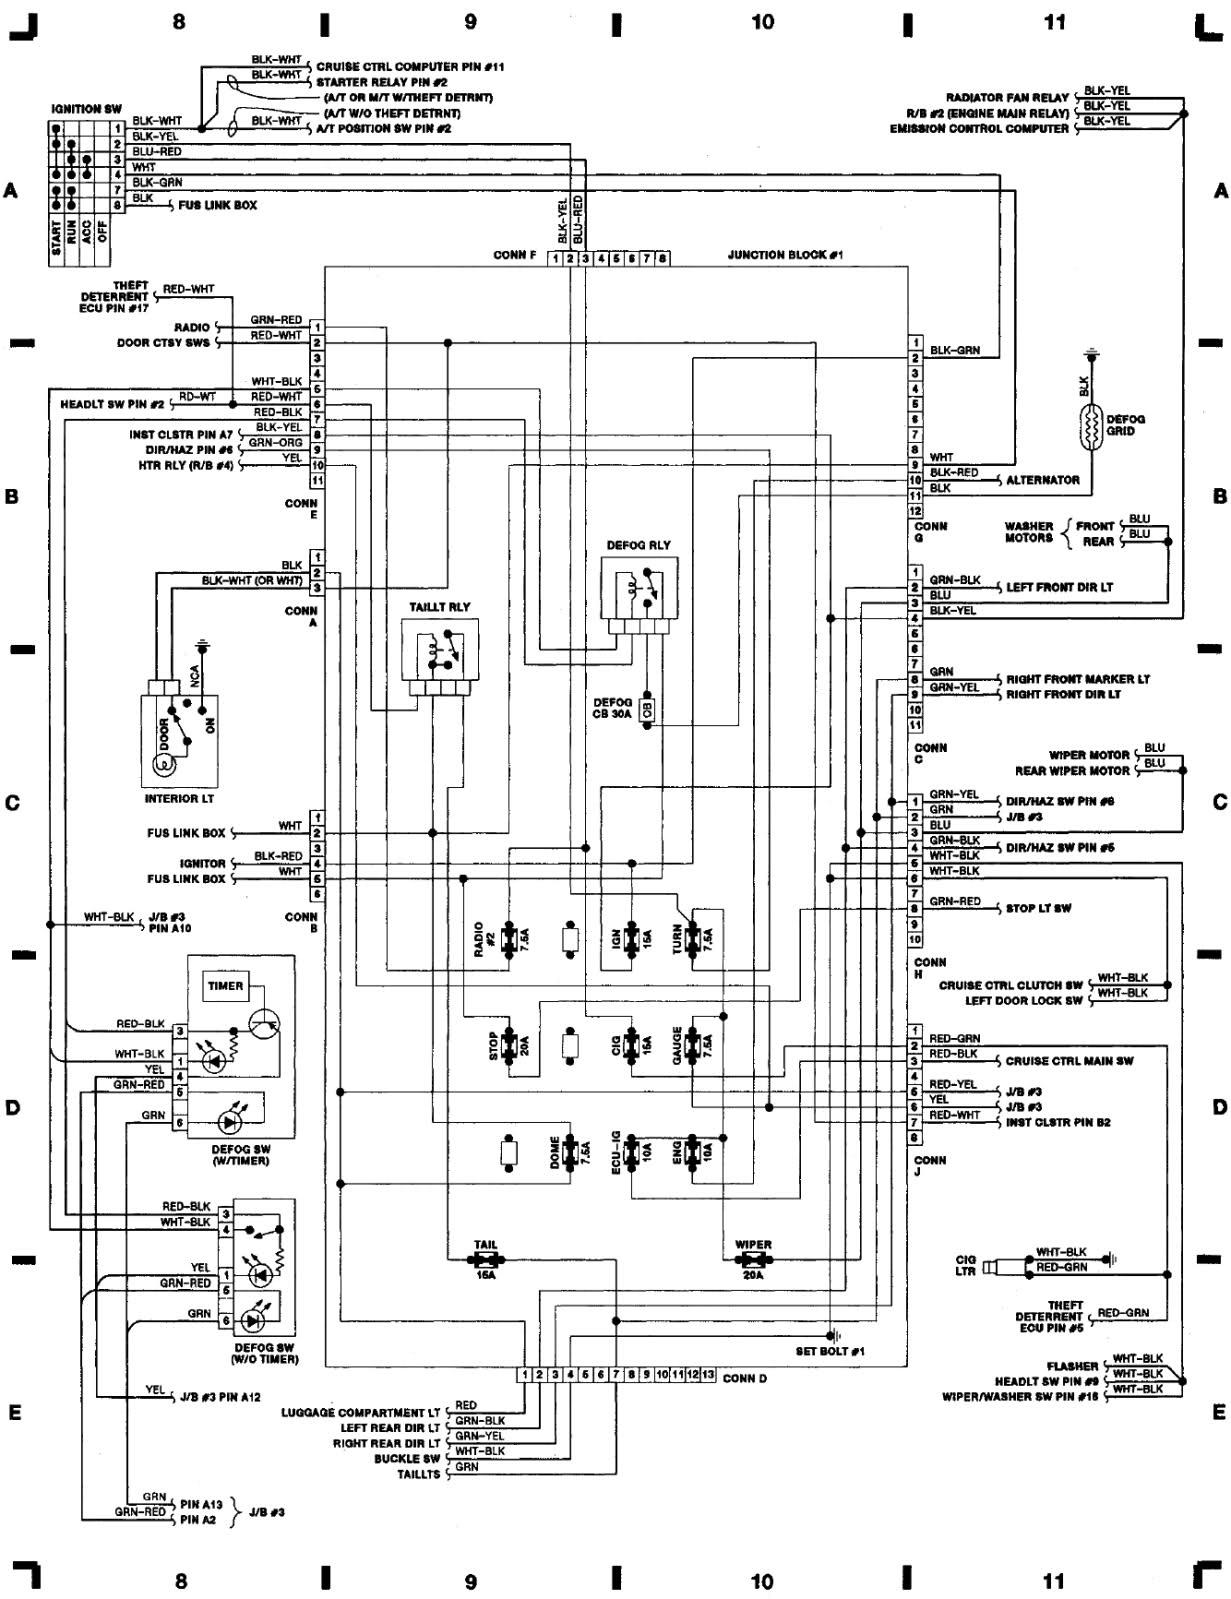 2002 toyota celica wiring diagram ibanez rg 770 2000 tundra sr5 html